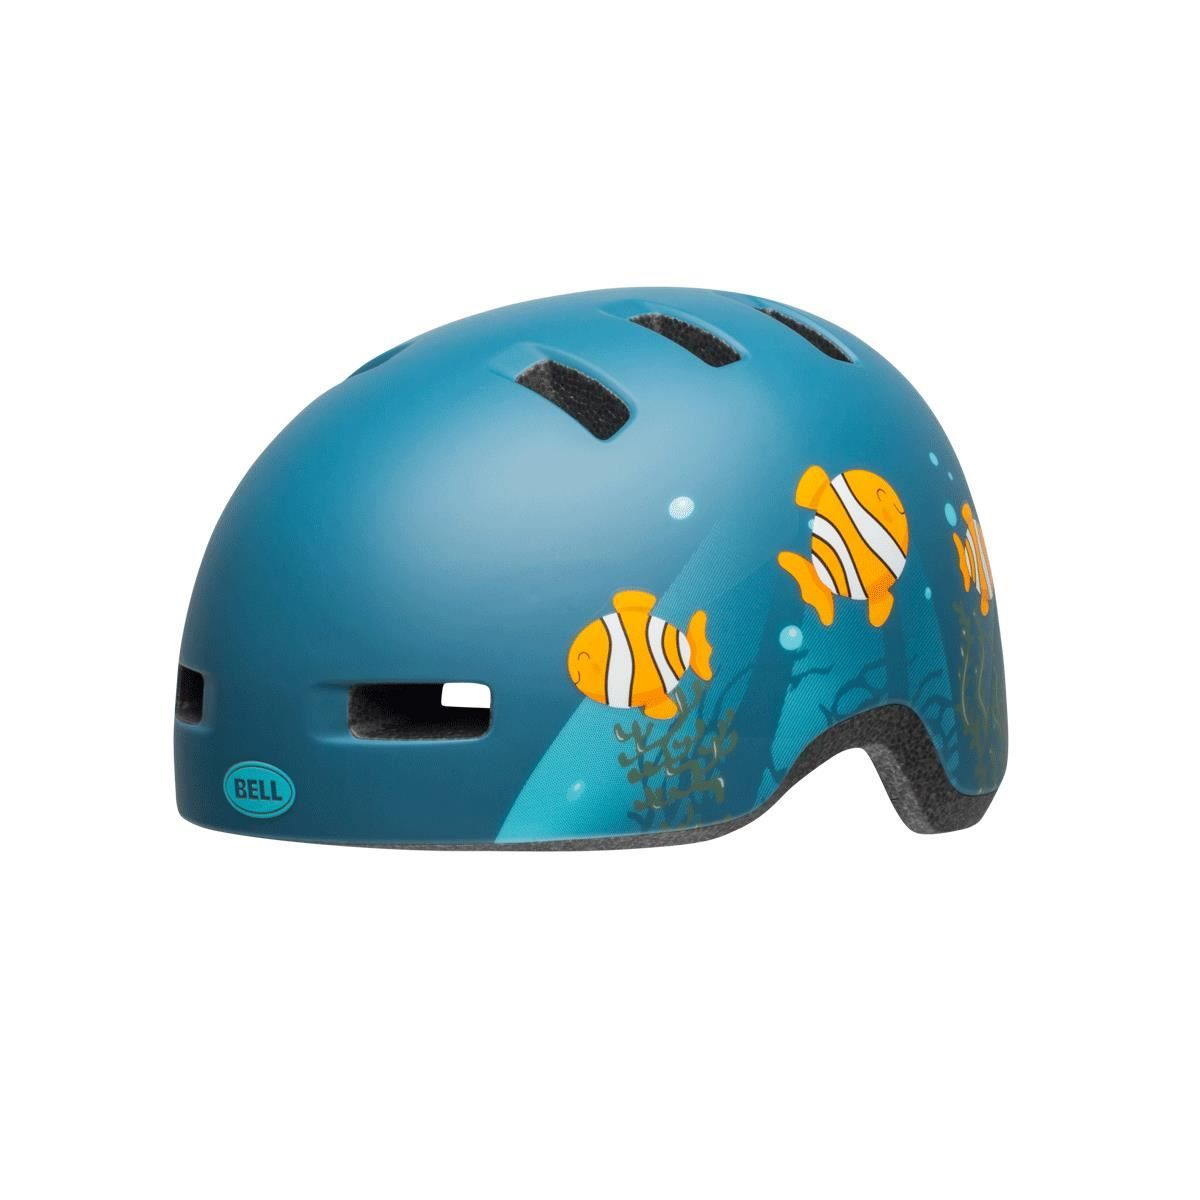 Bell Lil Ripper Toddler Helmet 2019: Clown Fish Matte Grey-Blue Unisize 45-51Cm